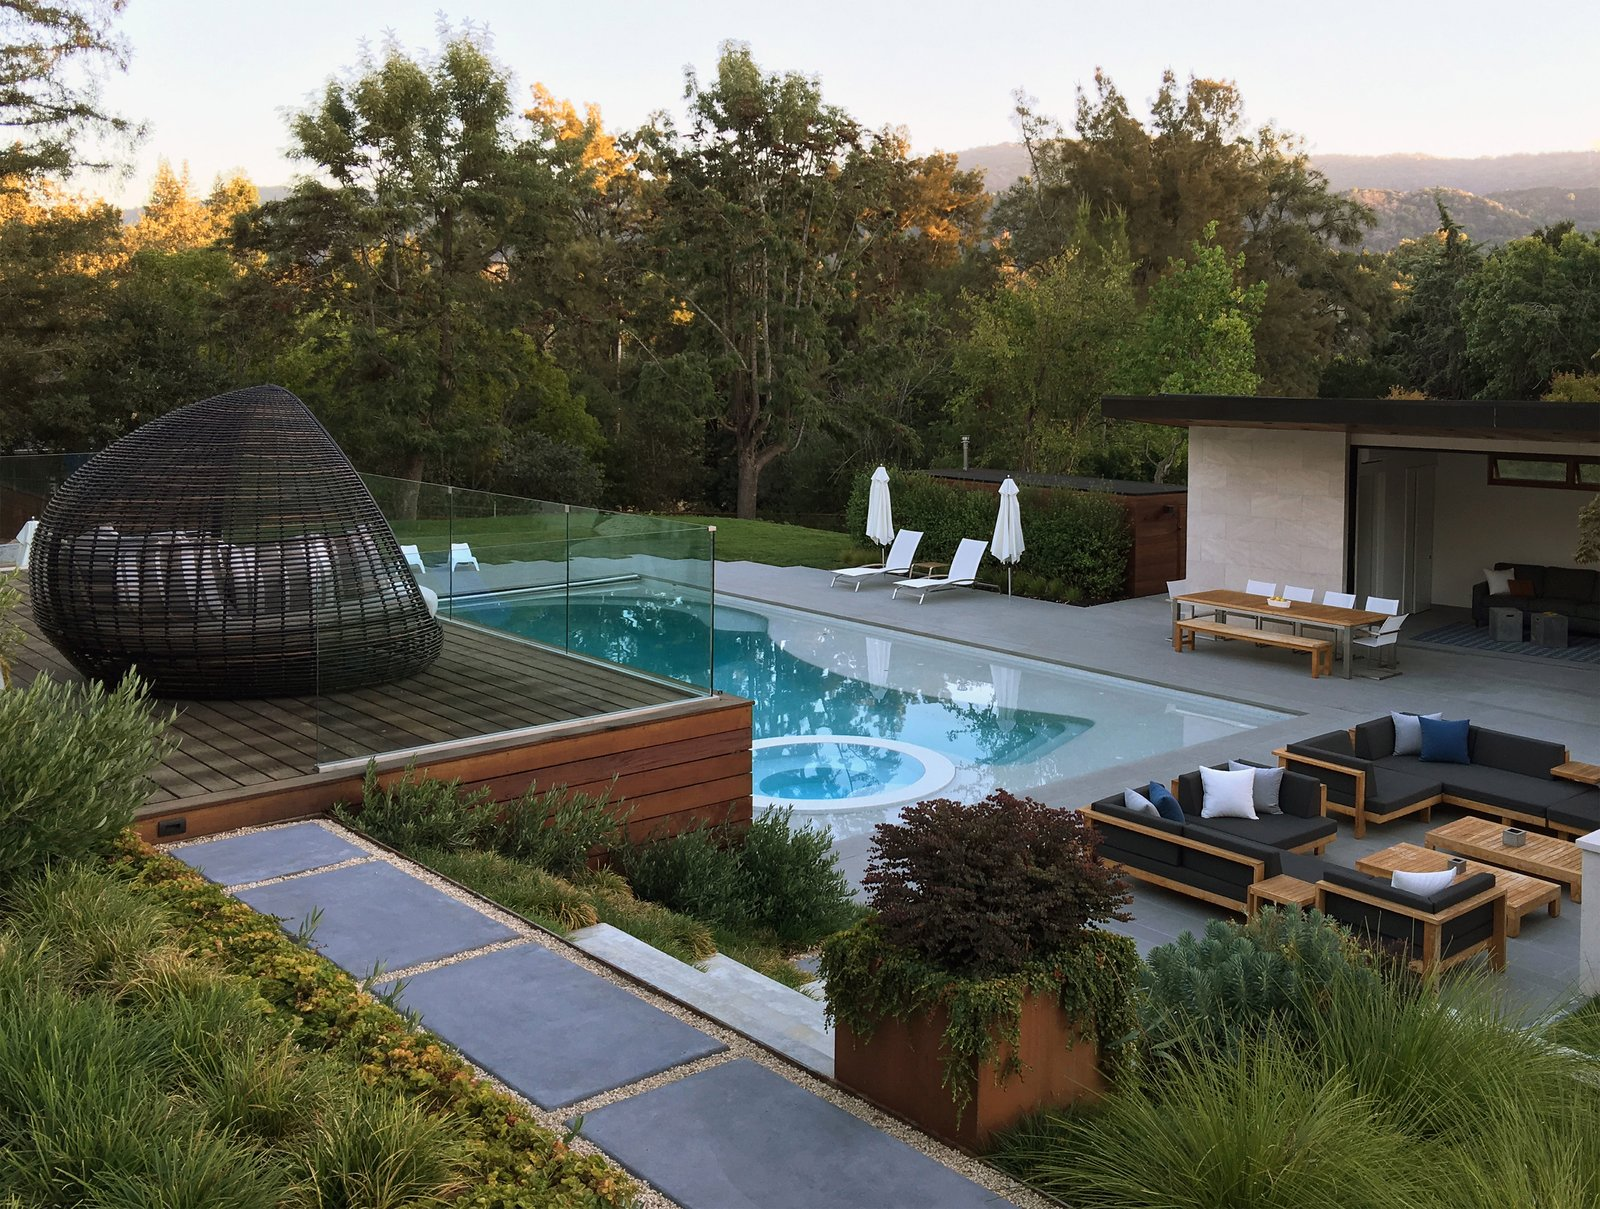 Terraced Decks to Pool & Pool House  Los Altos Hills Landscape by Greenblott Design